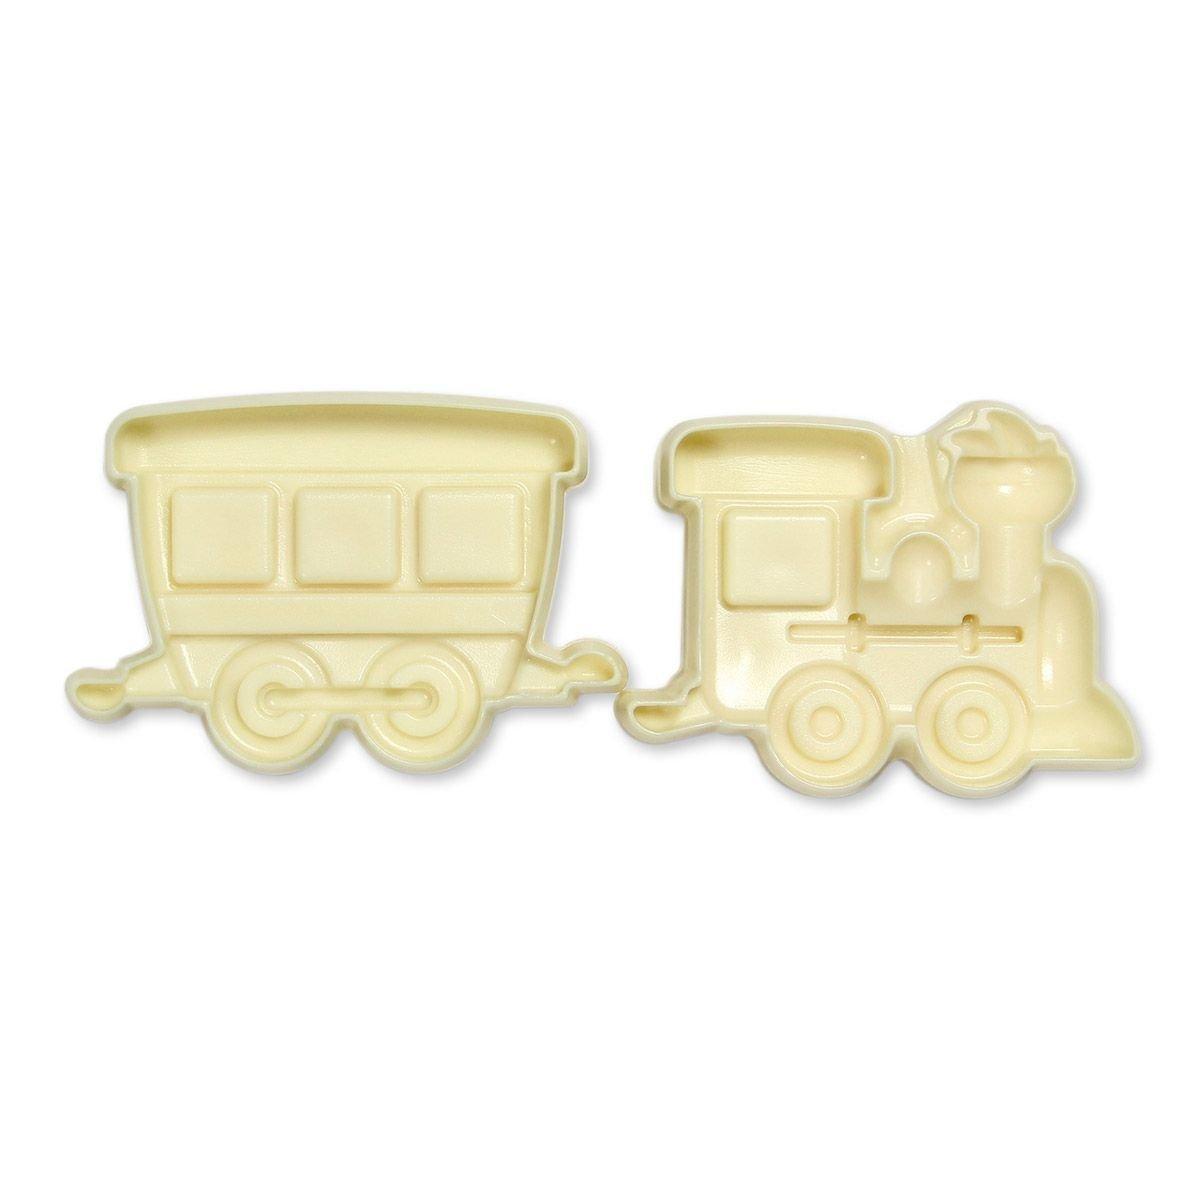 JEM Pop It Mould TRAIN & COACH -Καλούπι Τραίνο με Άμαξα -2 τεμ.